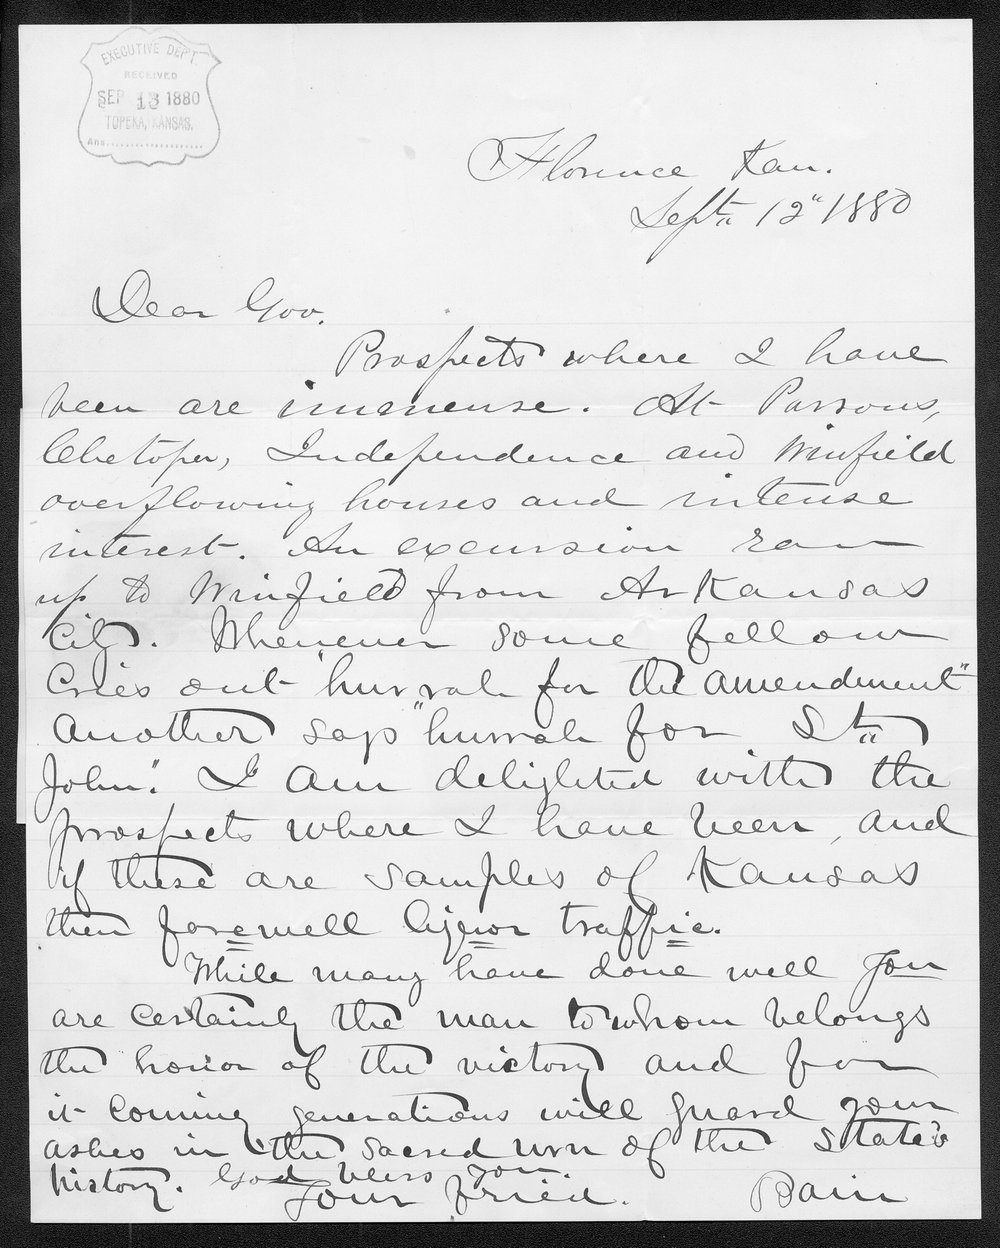 George Bain to Governor John St. John